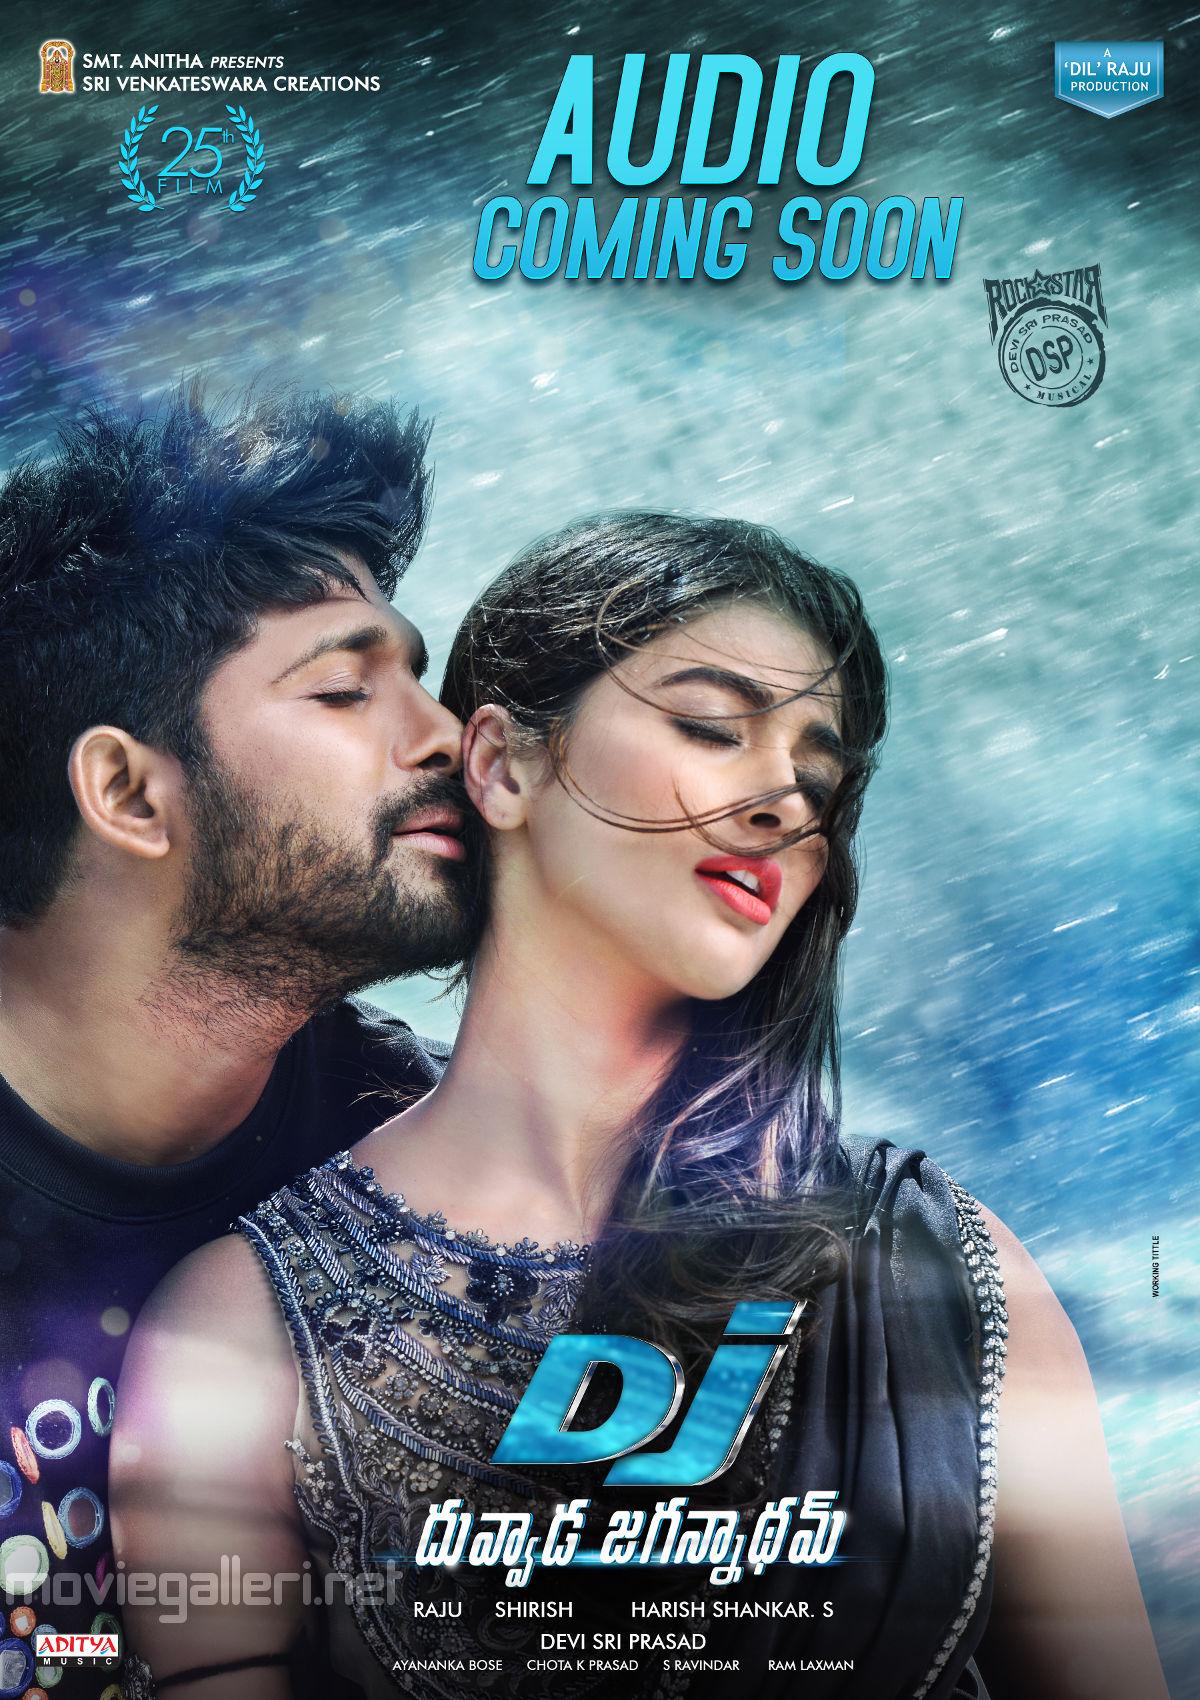 Actor Allu Arjun, Actress Pooja Hegde starrer Duvvada Jagannadham Movie Audio Coming Soon Poster